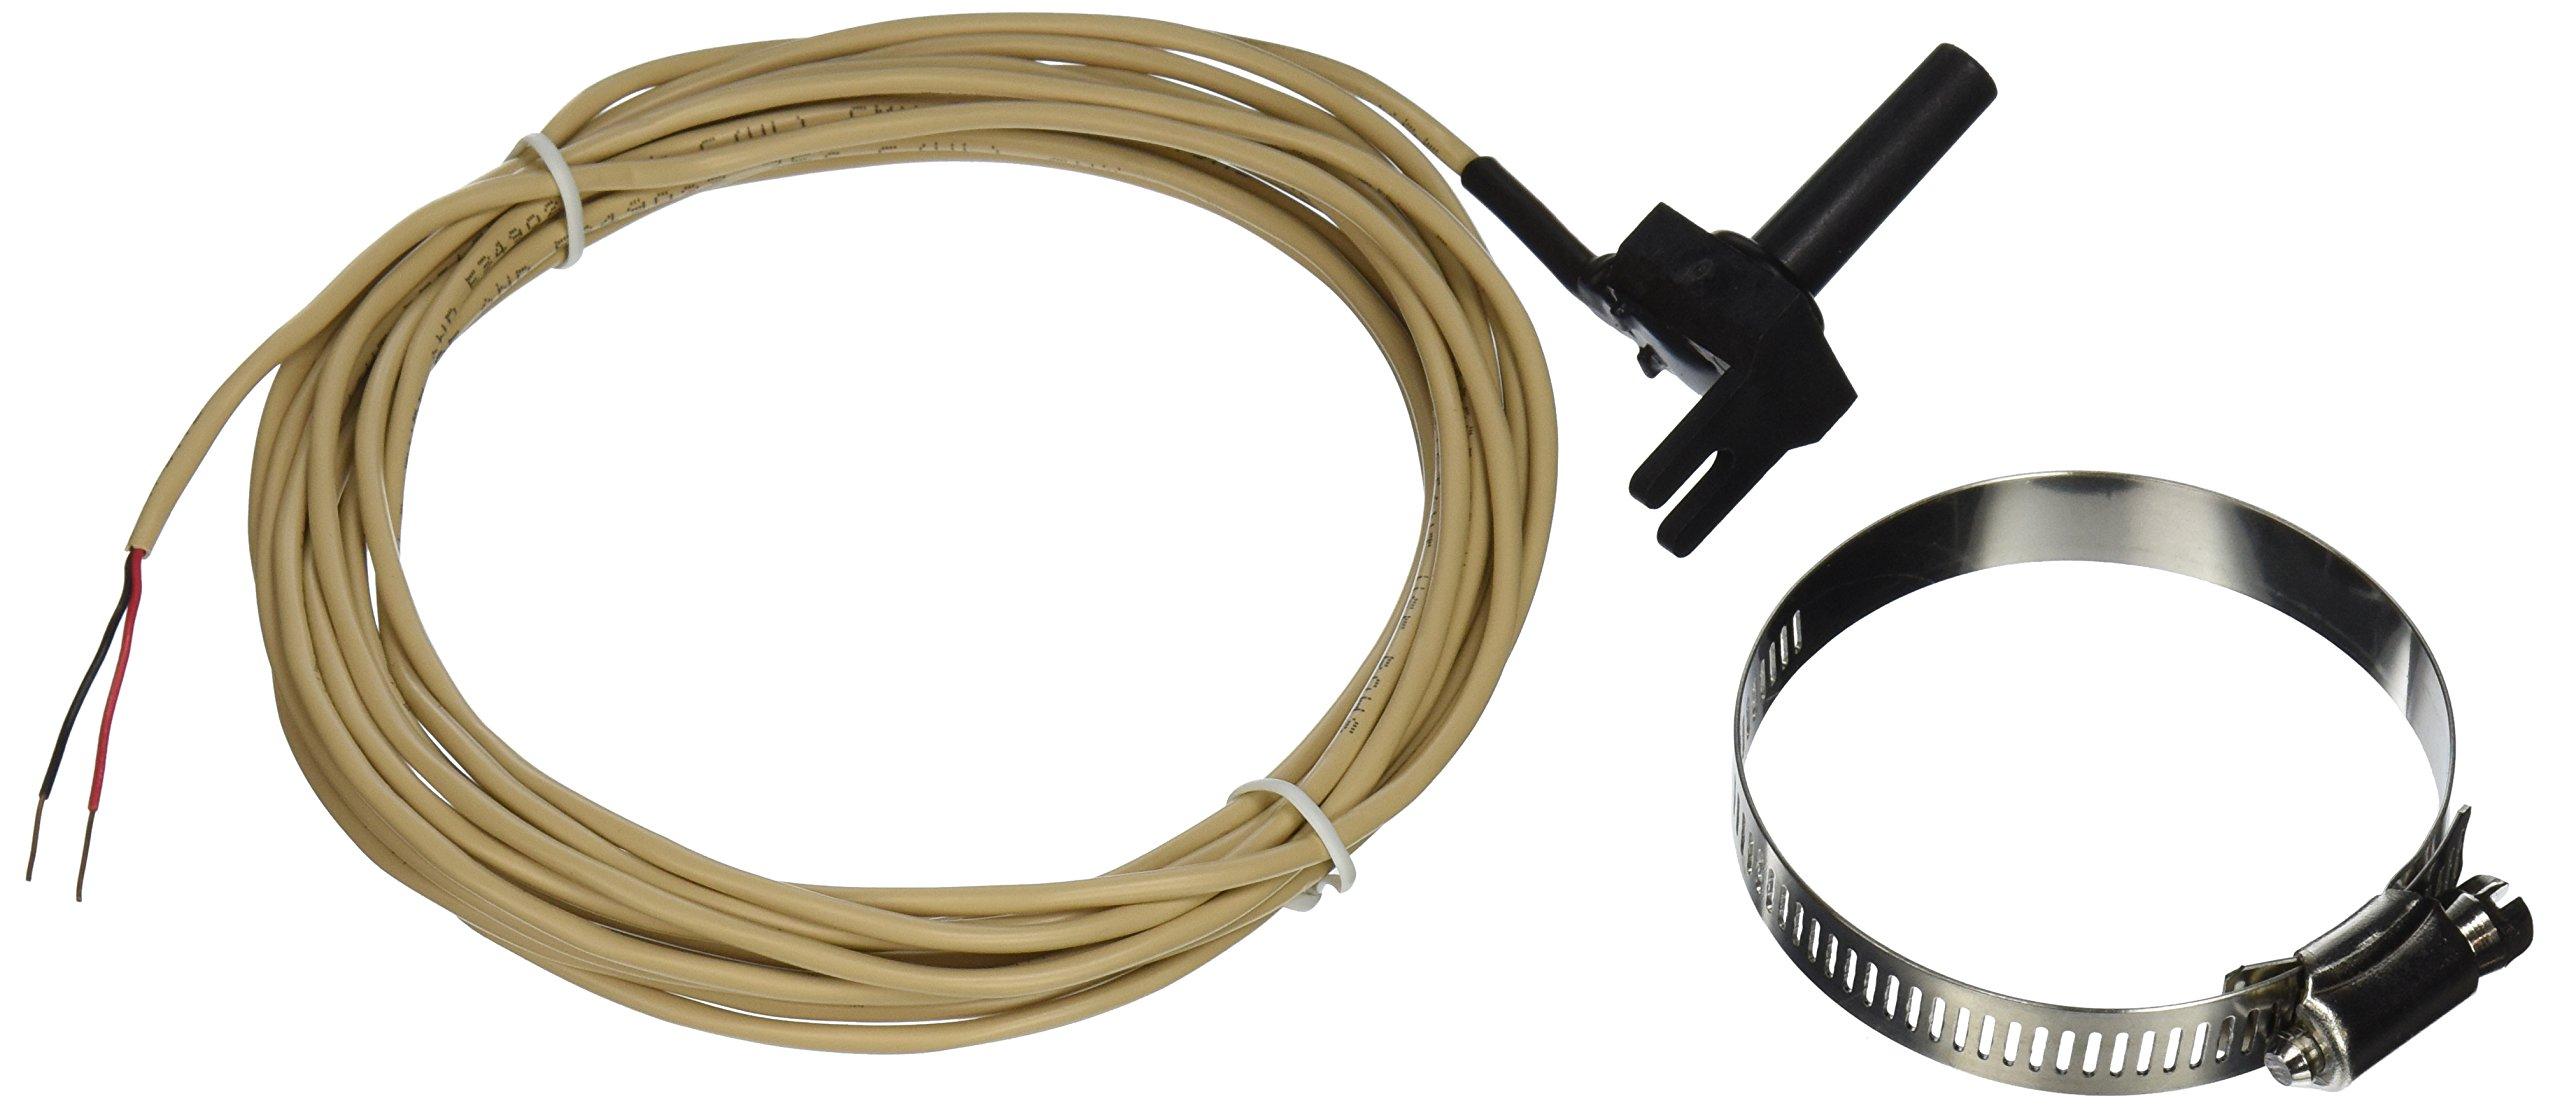 Hayward GLX-PC-12-KIT 10K Thermistor Temperature Sensor with 15-Feet Cable Replacement Kit for Hayward Salt Chlorine Generators